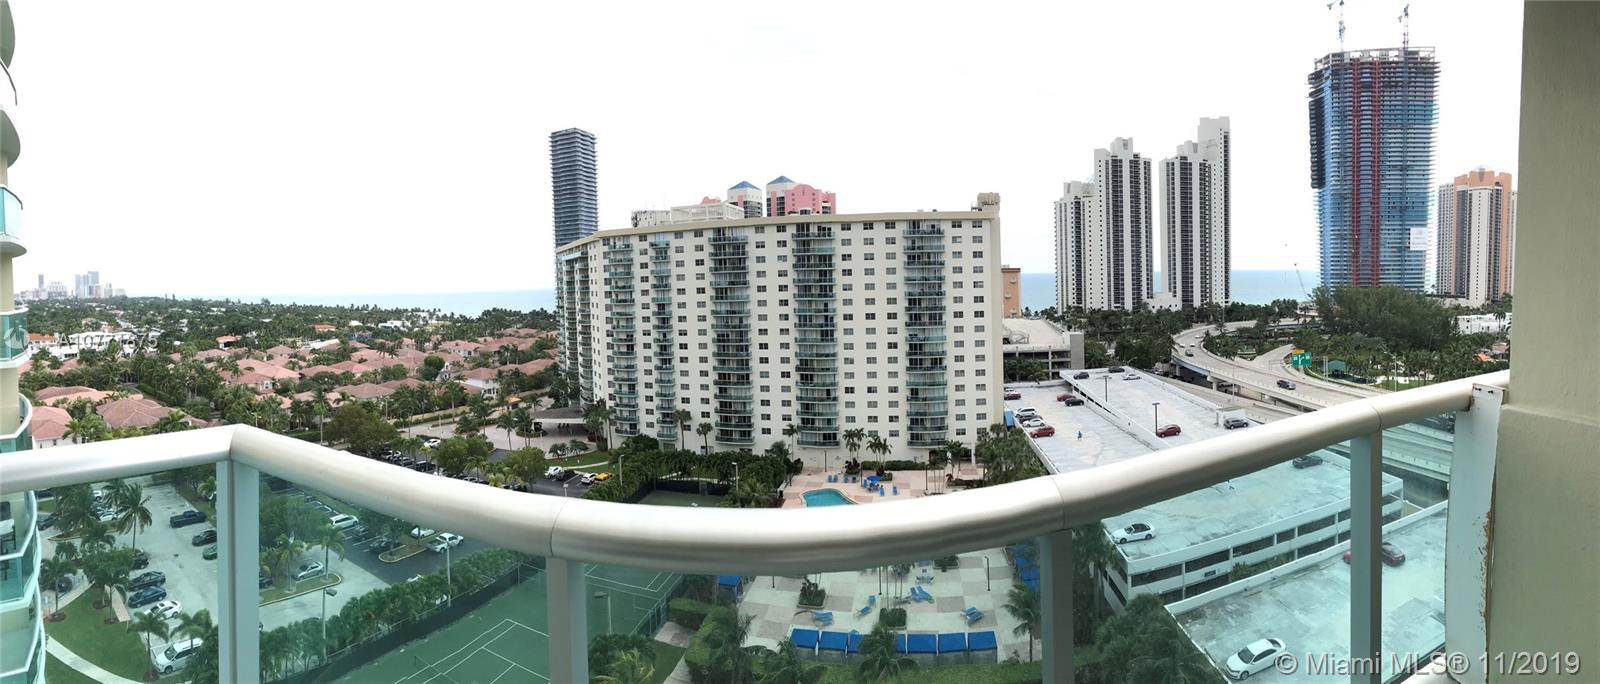 Oceanview image #4